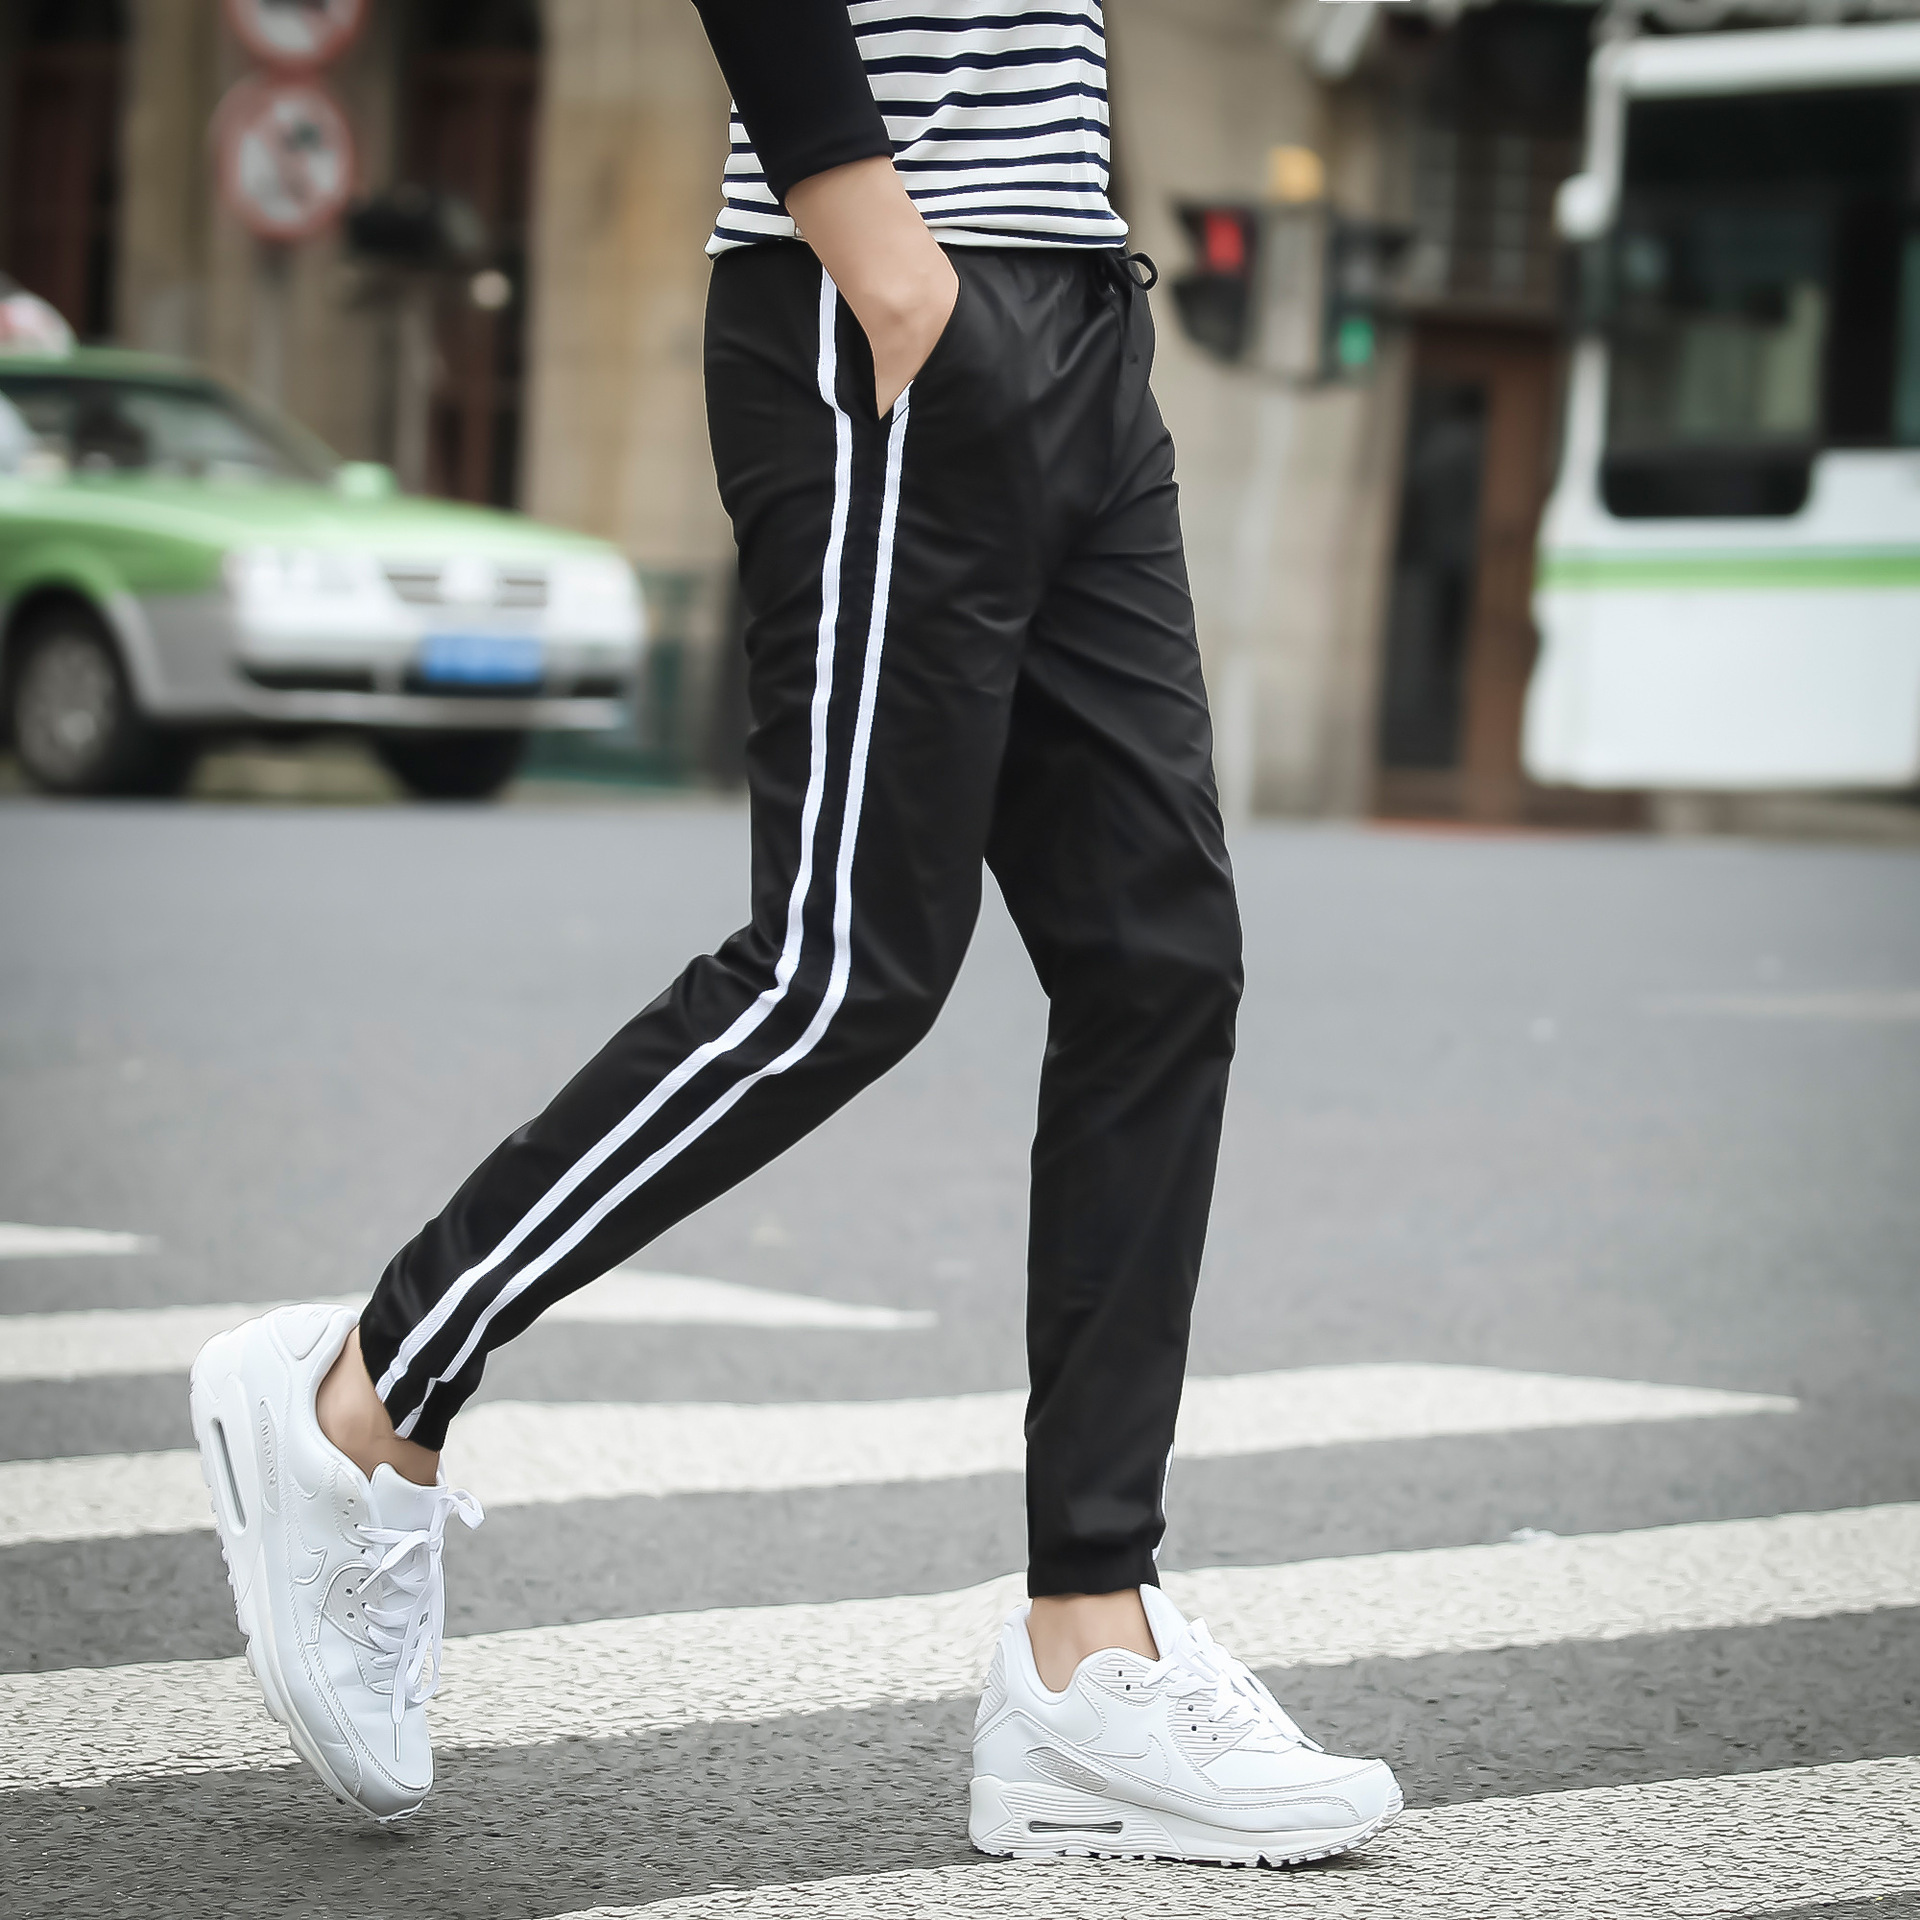 New Style Men's Trousers Harem Pants Fashion Man Korean-style Slim Fit Stripes Long Pants Students Sweatpants Casual Sports Pant